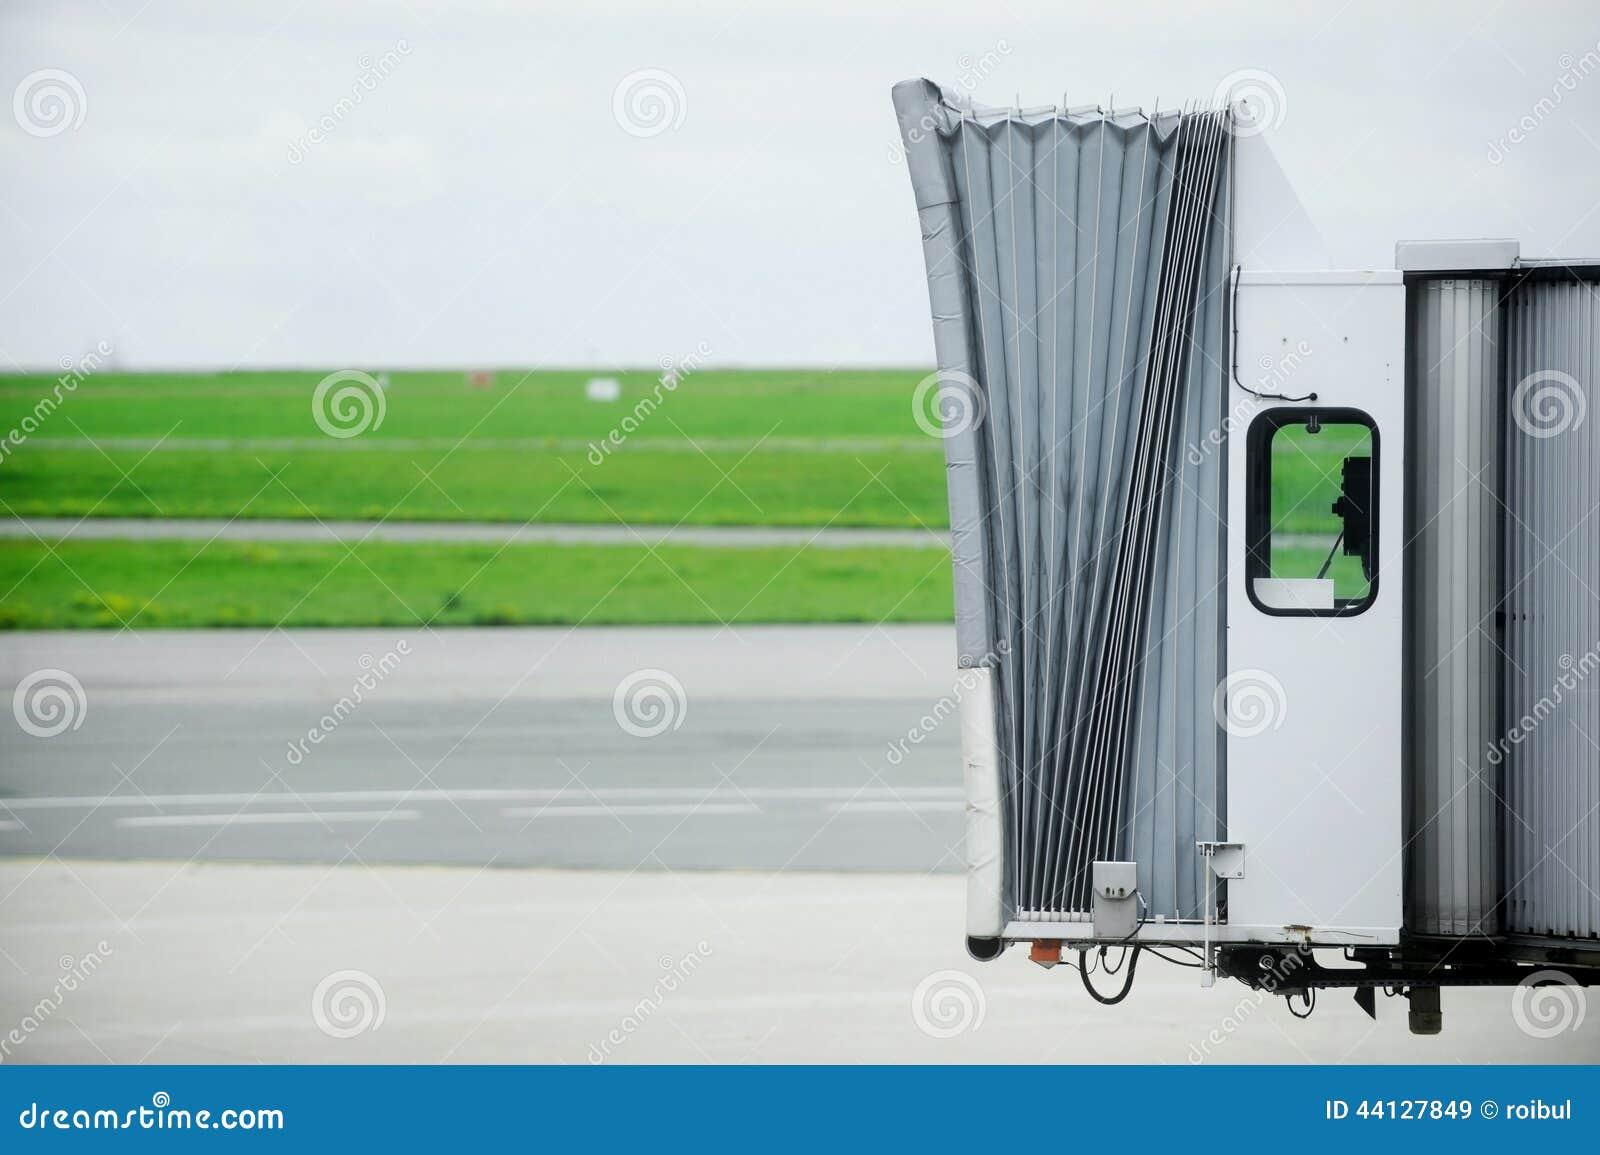 jet bridge stock photo cartoondealer com 53269806 Luggage Clip Art Airport Check in Clip Art